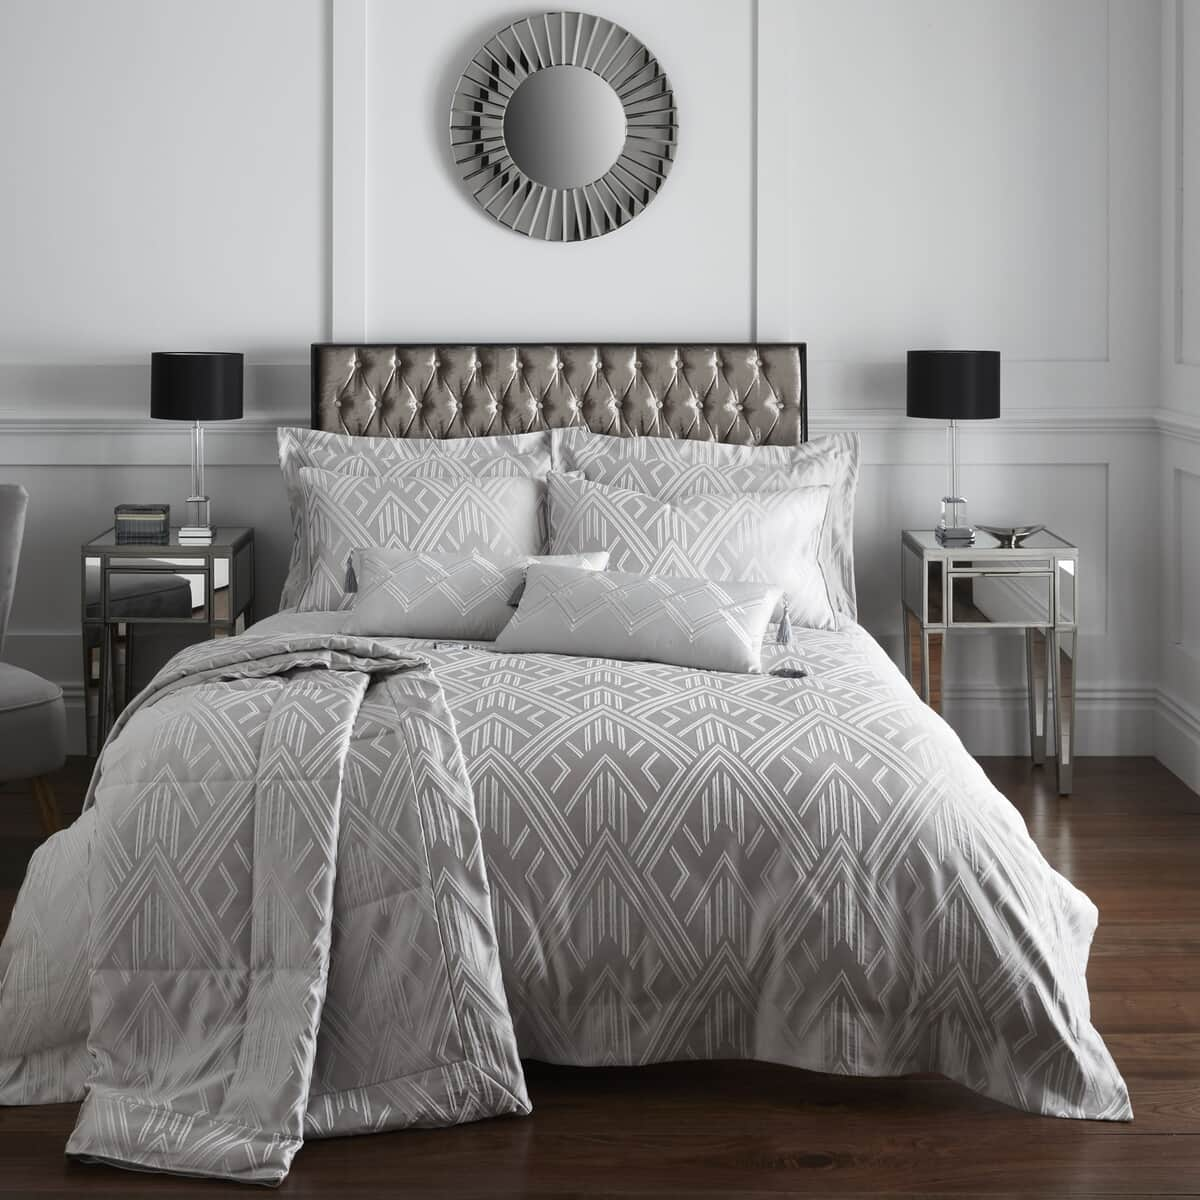 Dorma Fitzgerald large